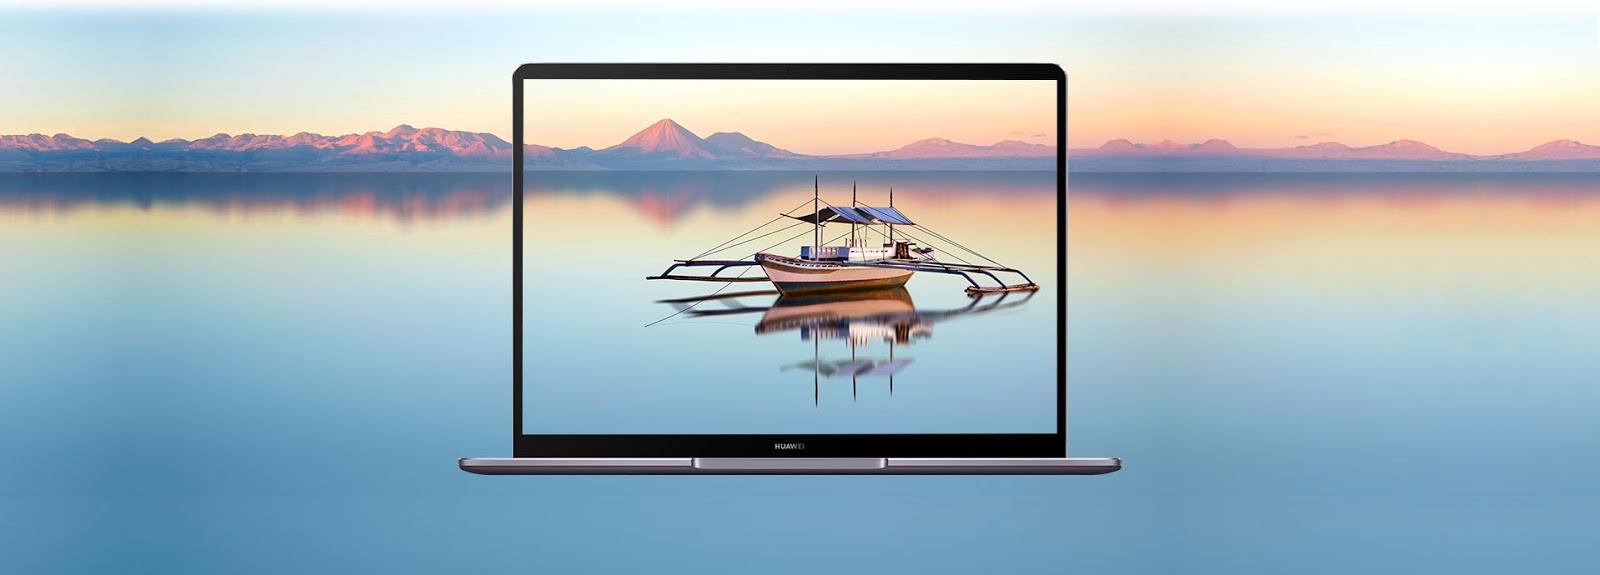 CES 2019: Huawei presenta la MateBook 13